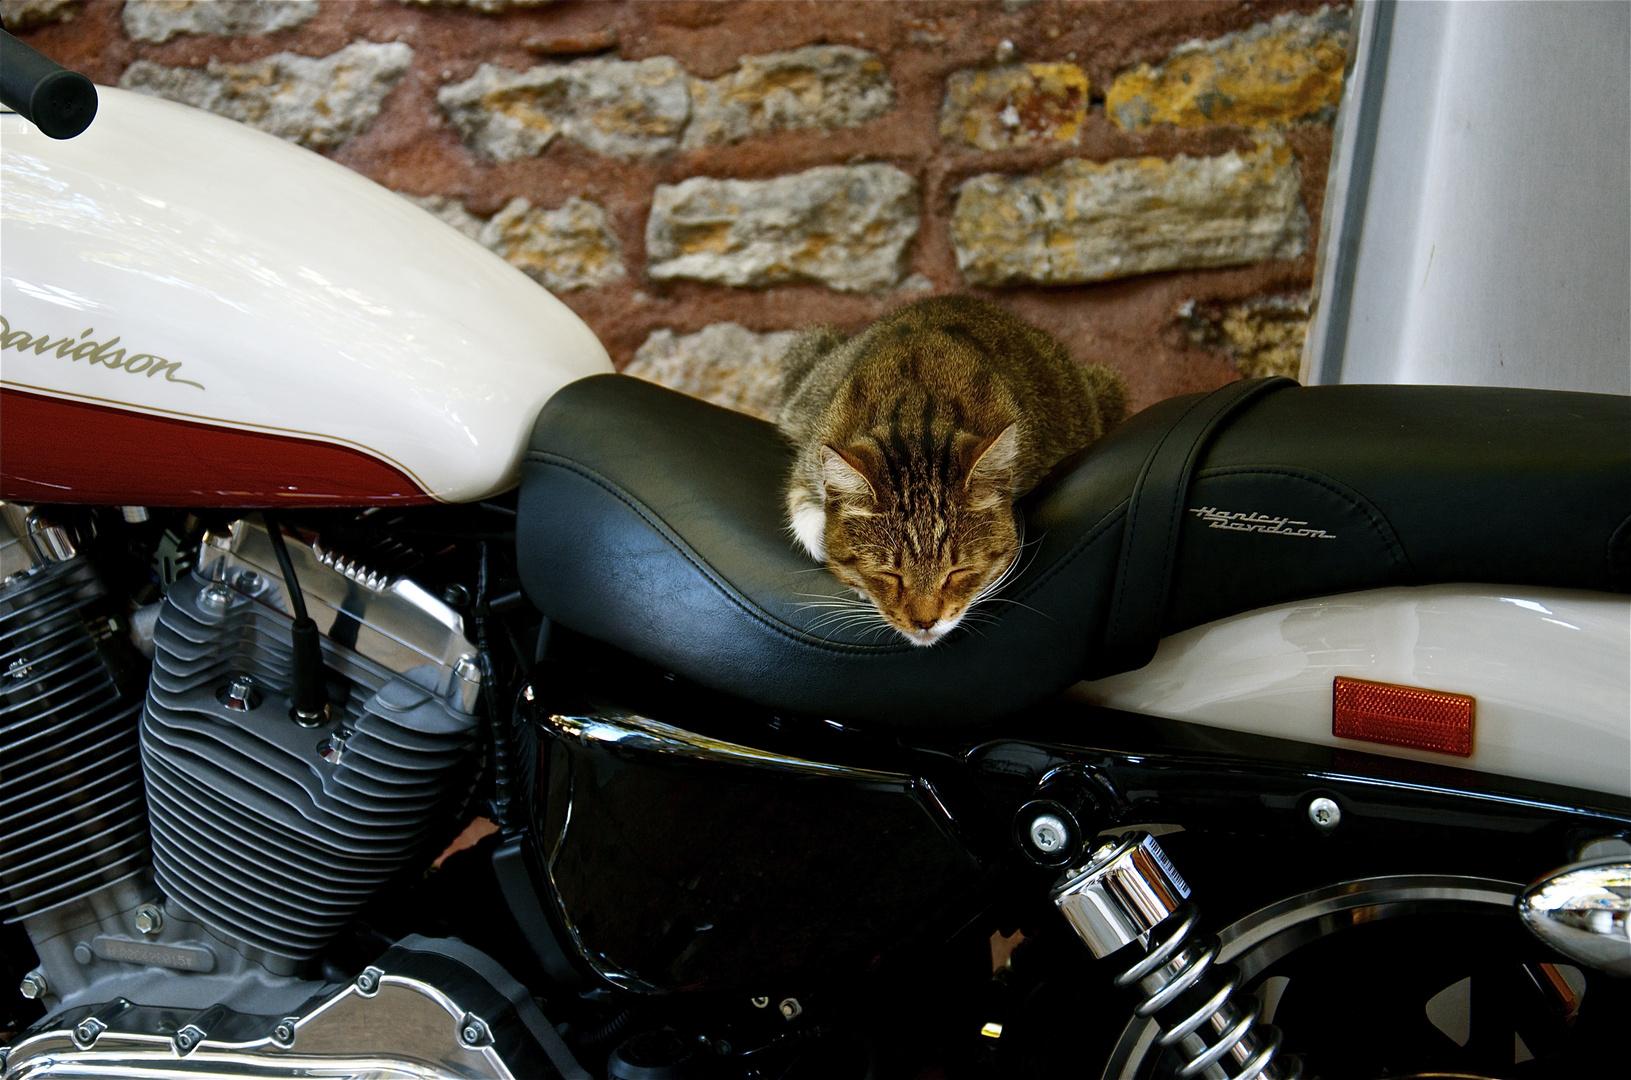 Harley Davidson Cat